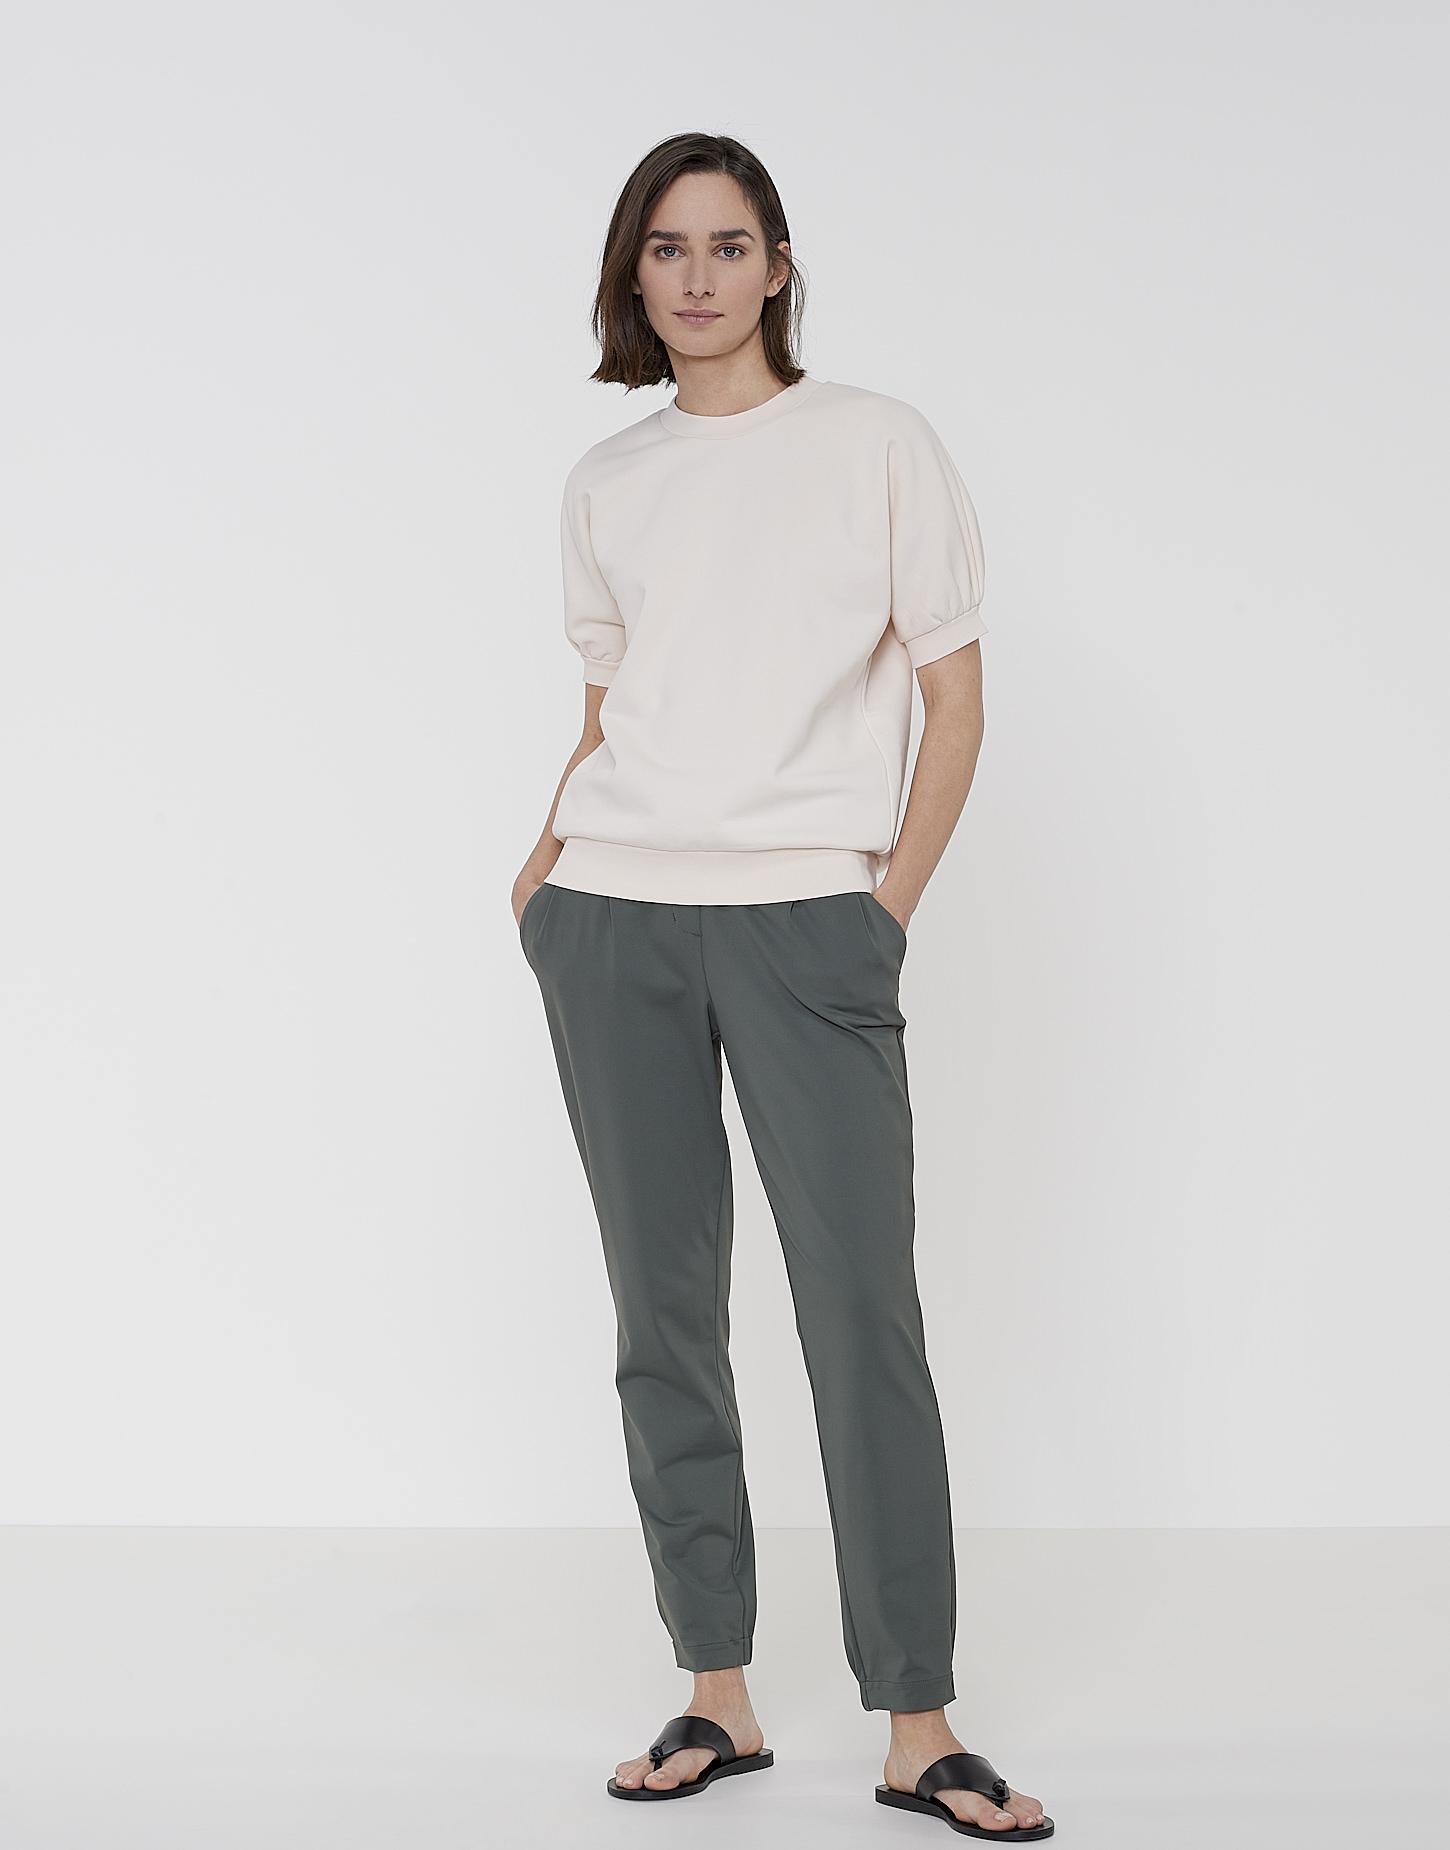 sweatshirt grilly ros online bestellen opus online shop. Black Bedroom Furniture Sets. Home Design Ideas